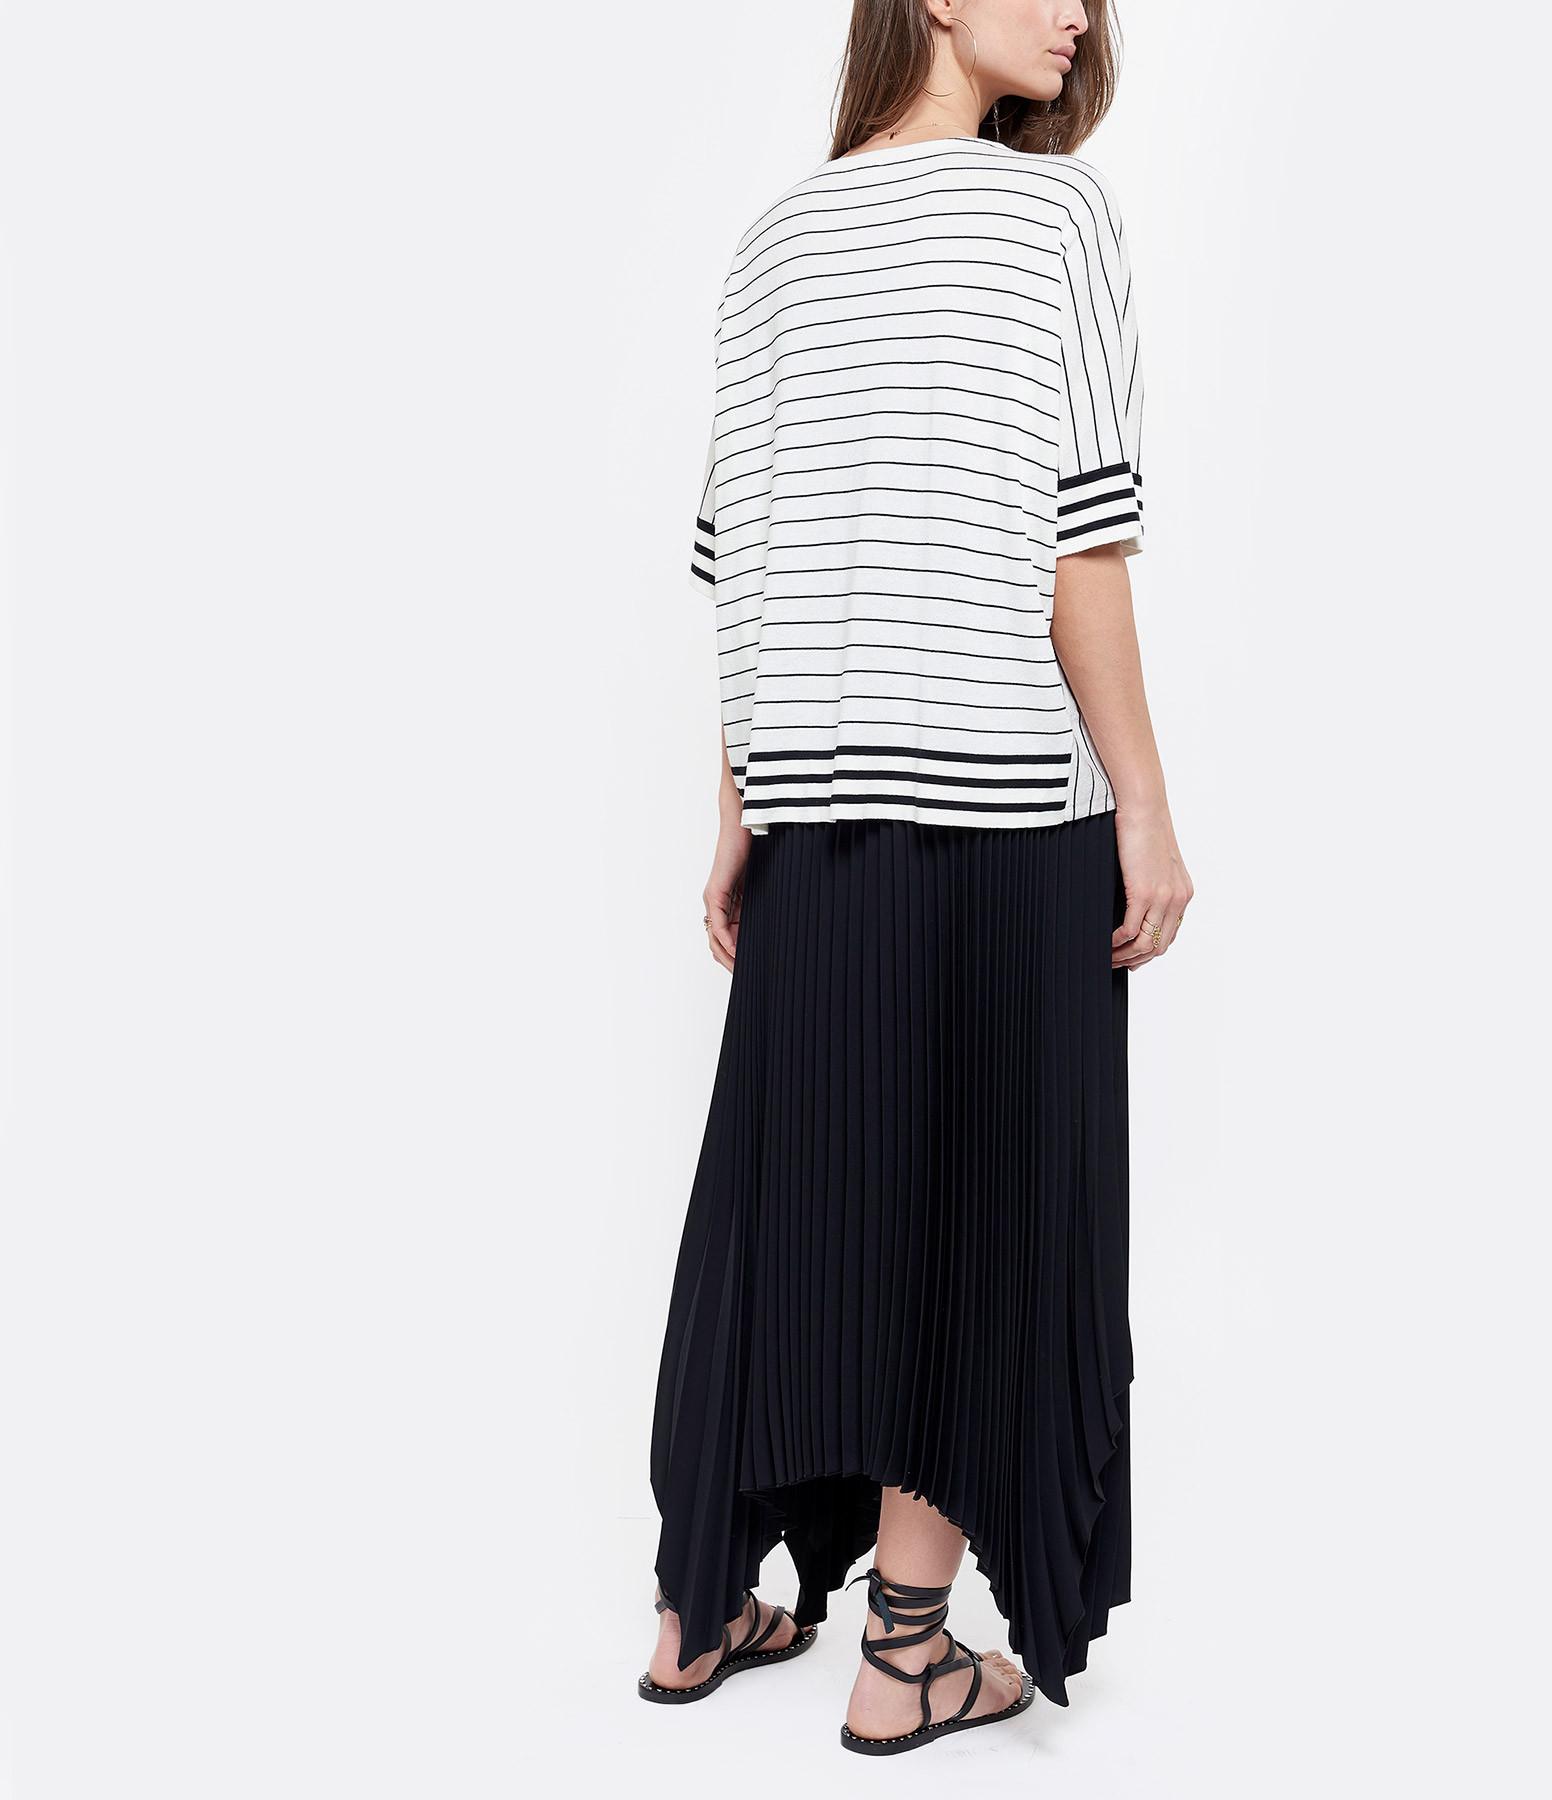 CT PLAGE - Tee-shirt Coton Soie Rayures Noir Blanc